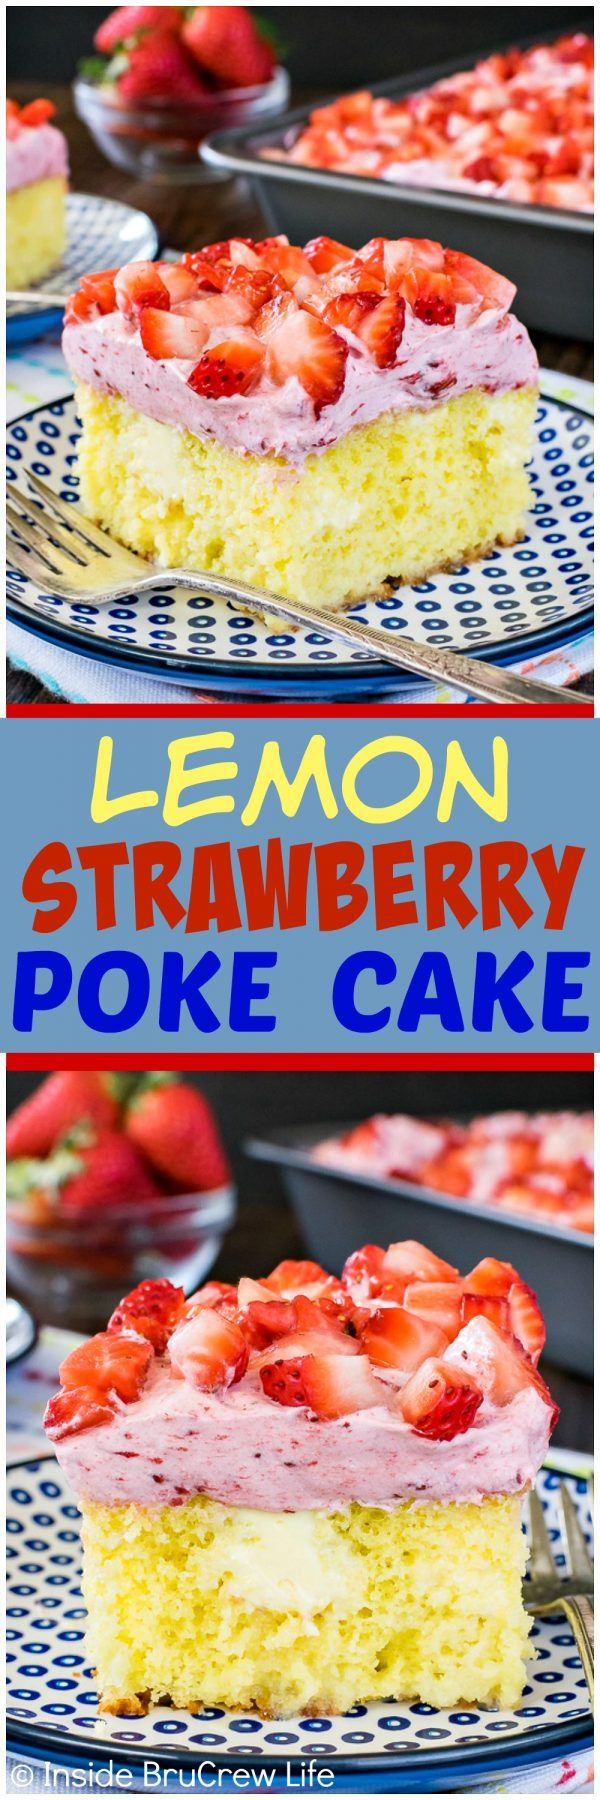 Lemon Strawberry Poke Cake